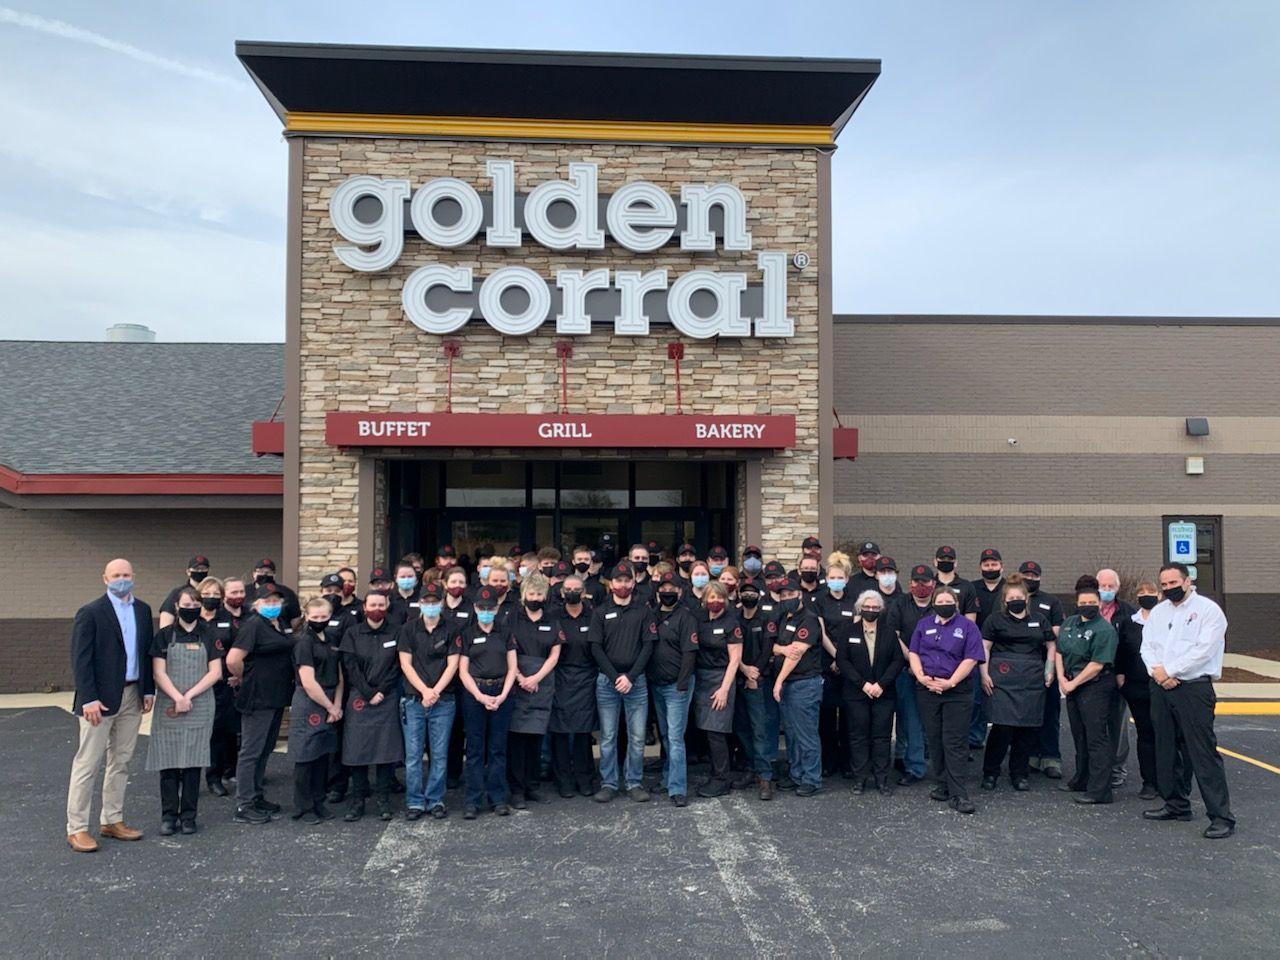 Golden Corral Celebrates Grand Opening of First Effingham Restaurant